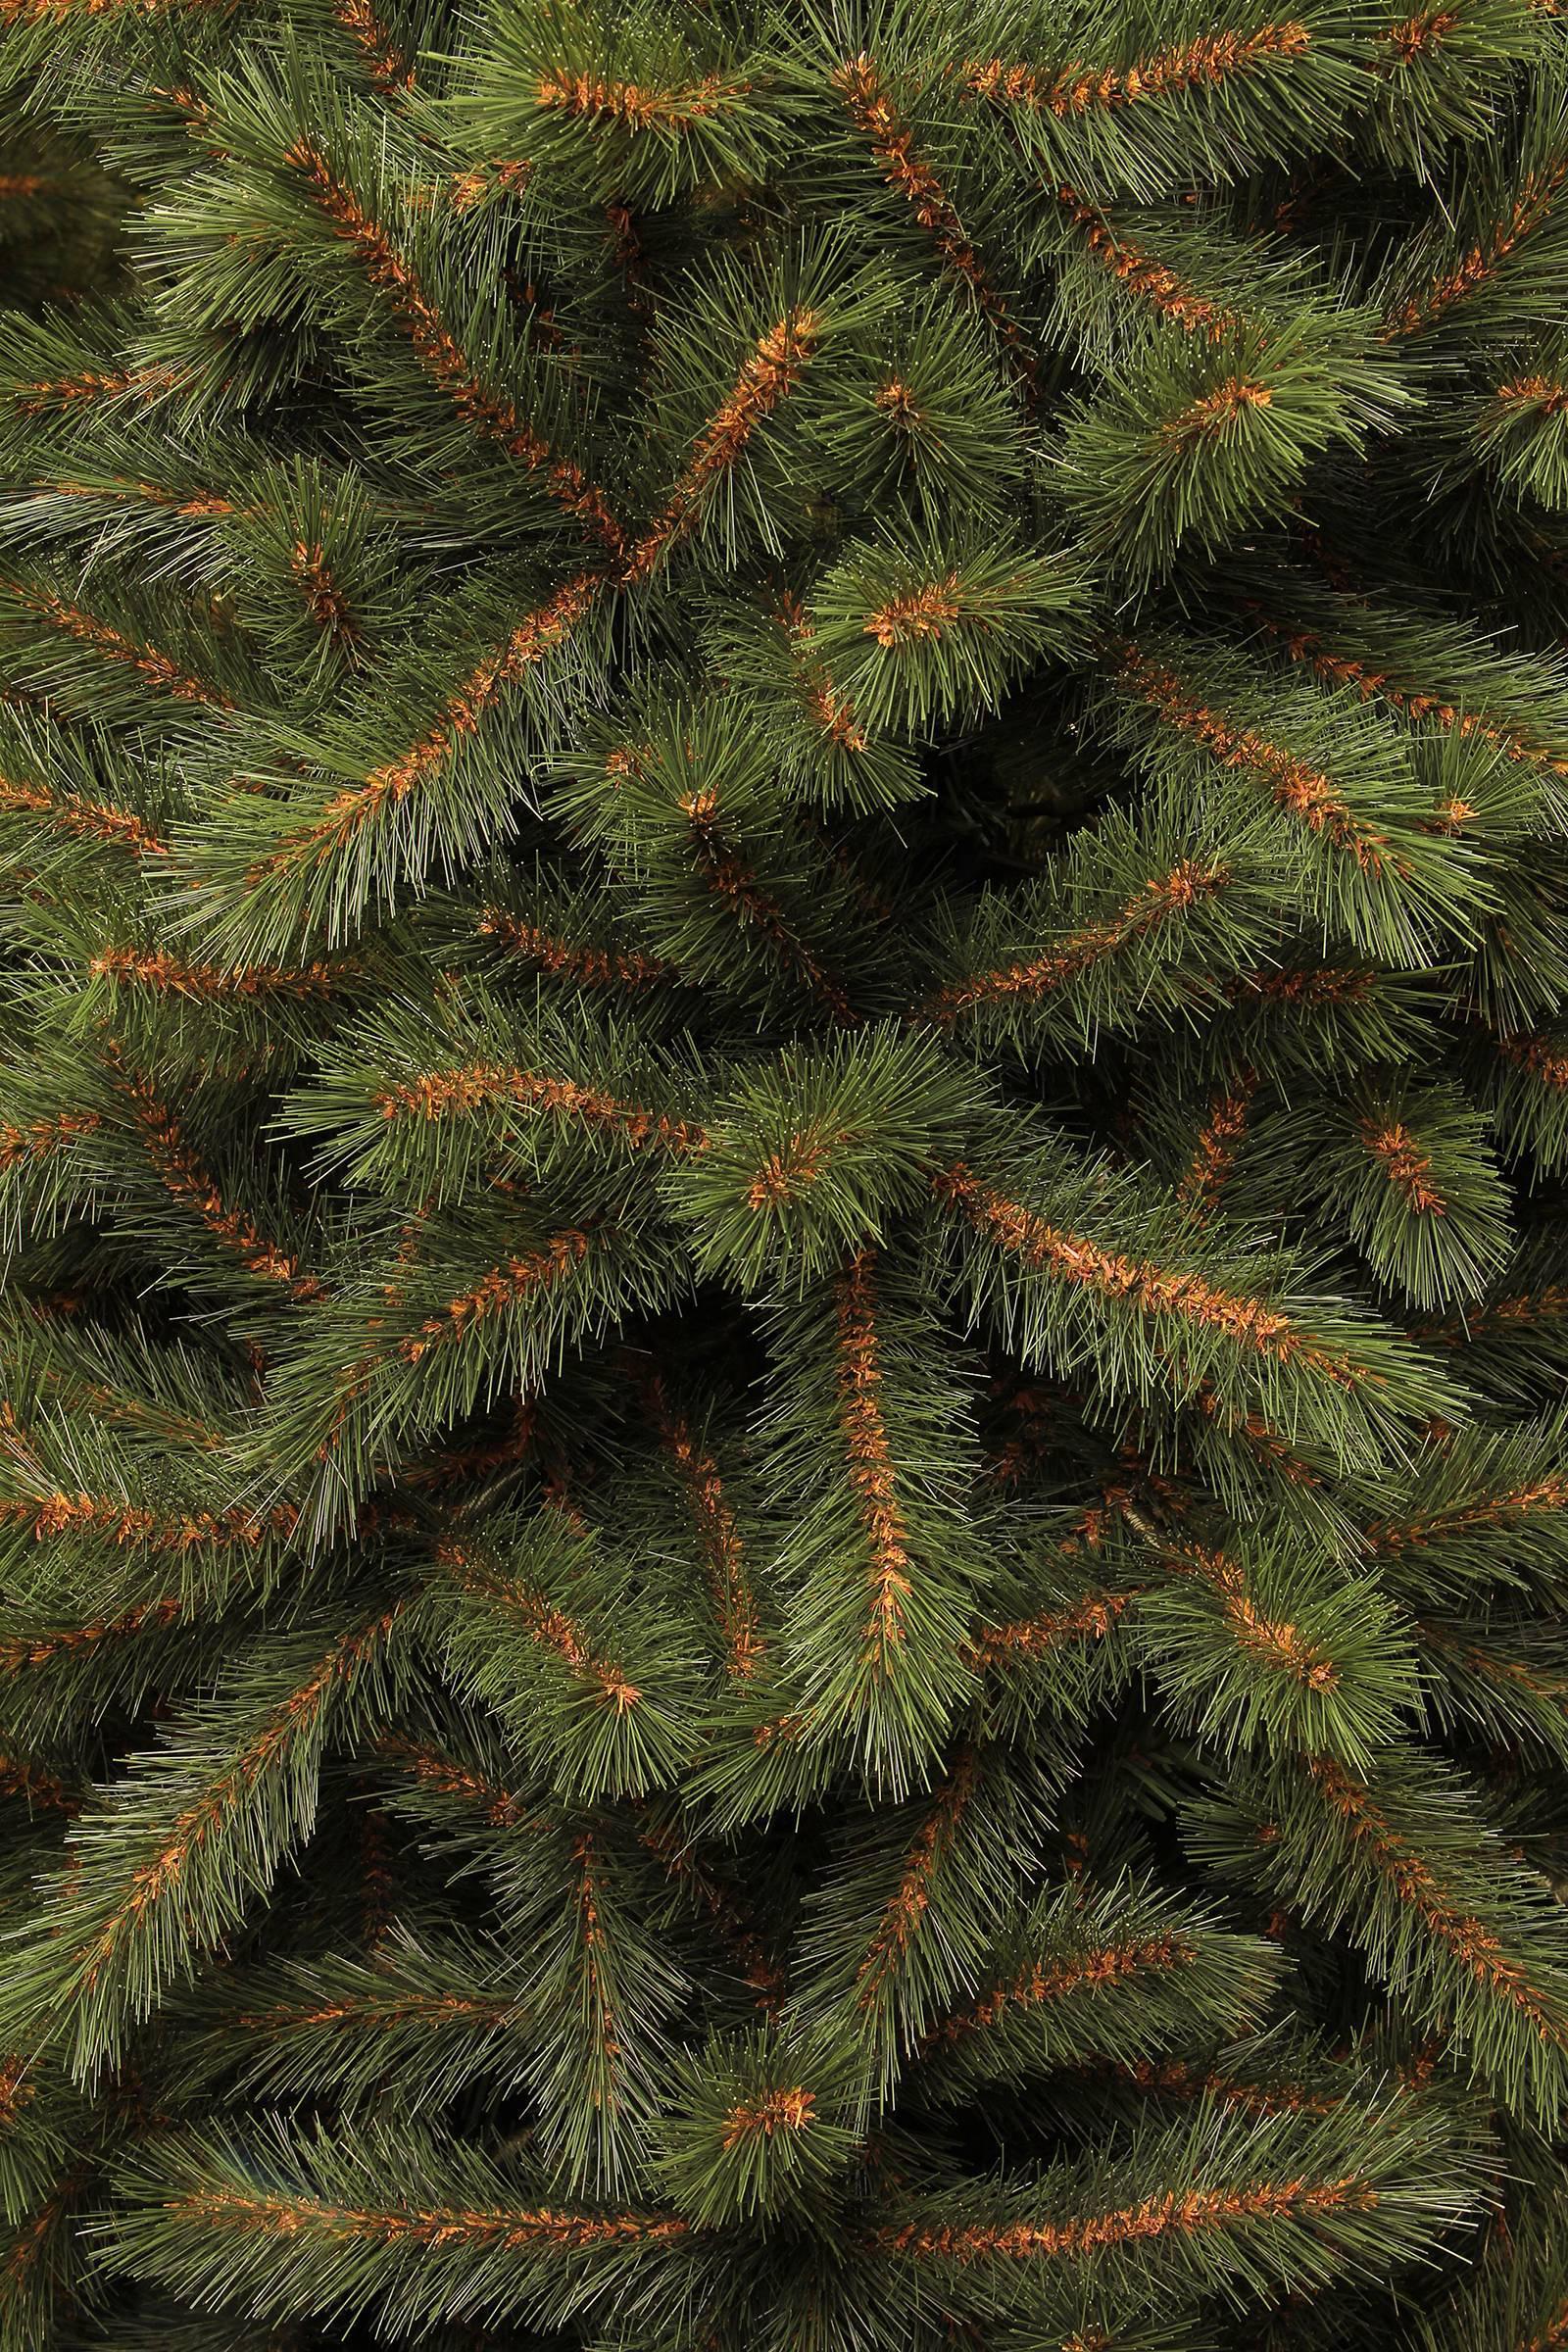 black box kerstboom kingston h155 x 86 cm wehkamp